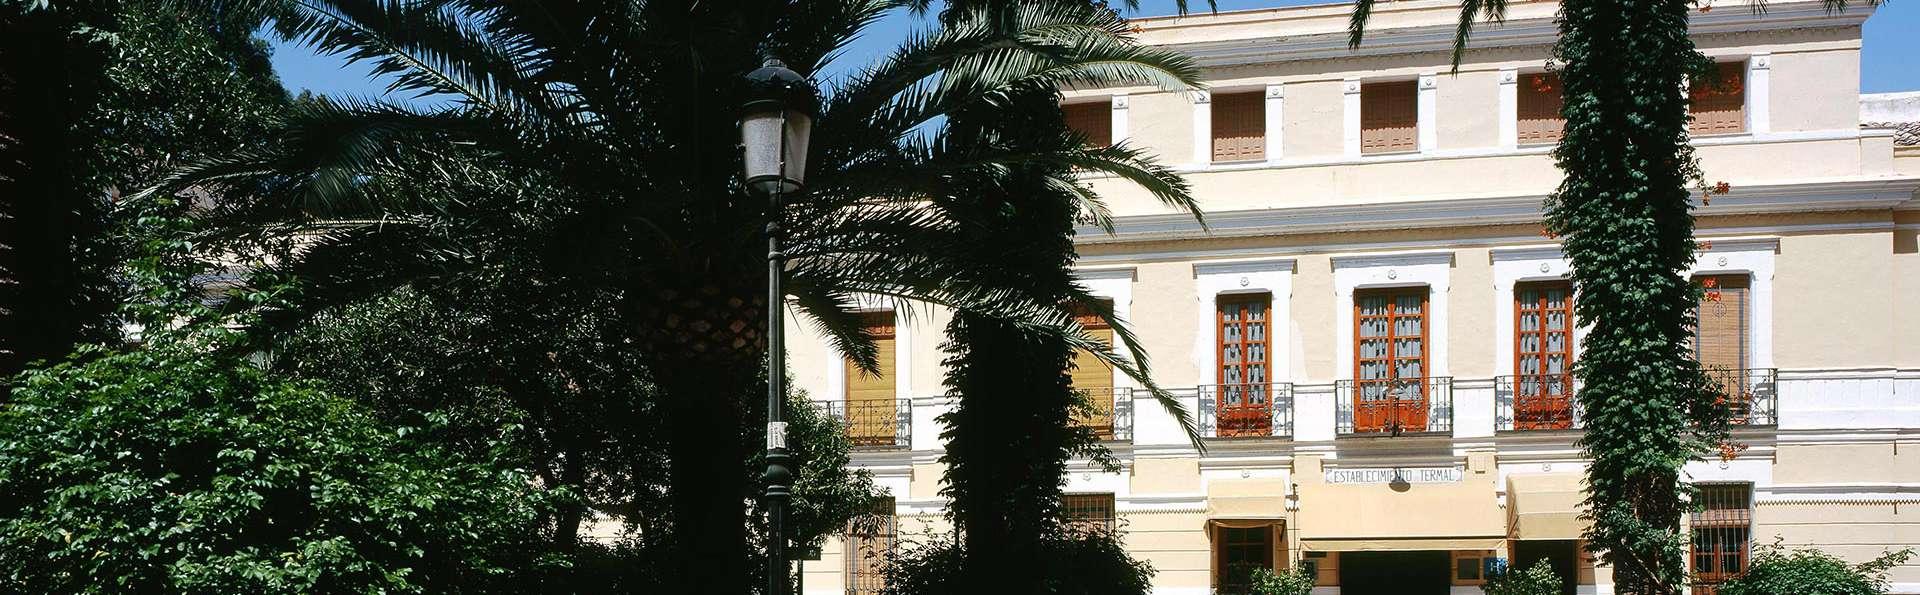 Balneario de Archena - Hotel Termas - EDIT_NEW_front2.jpg